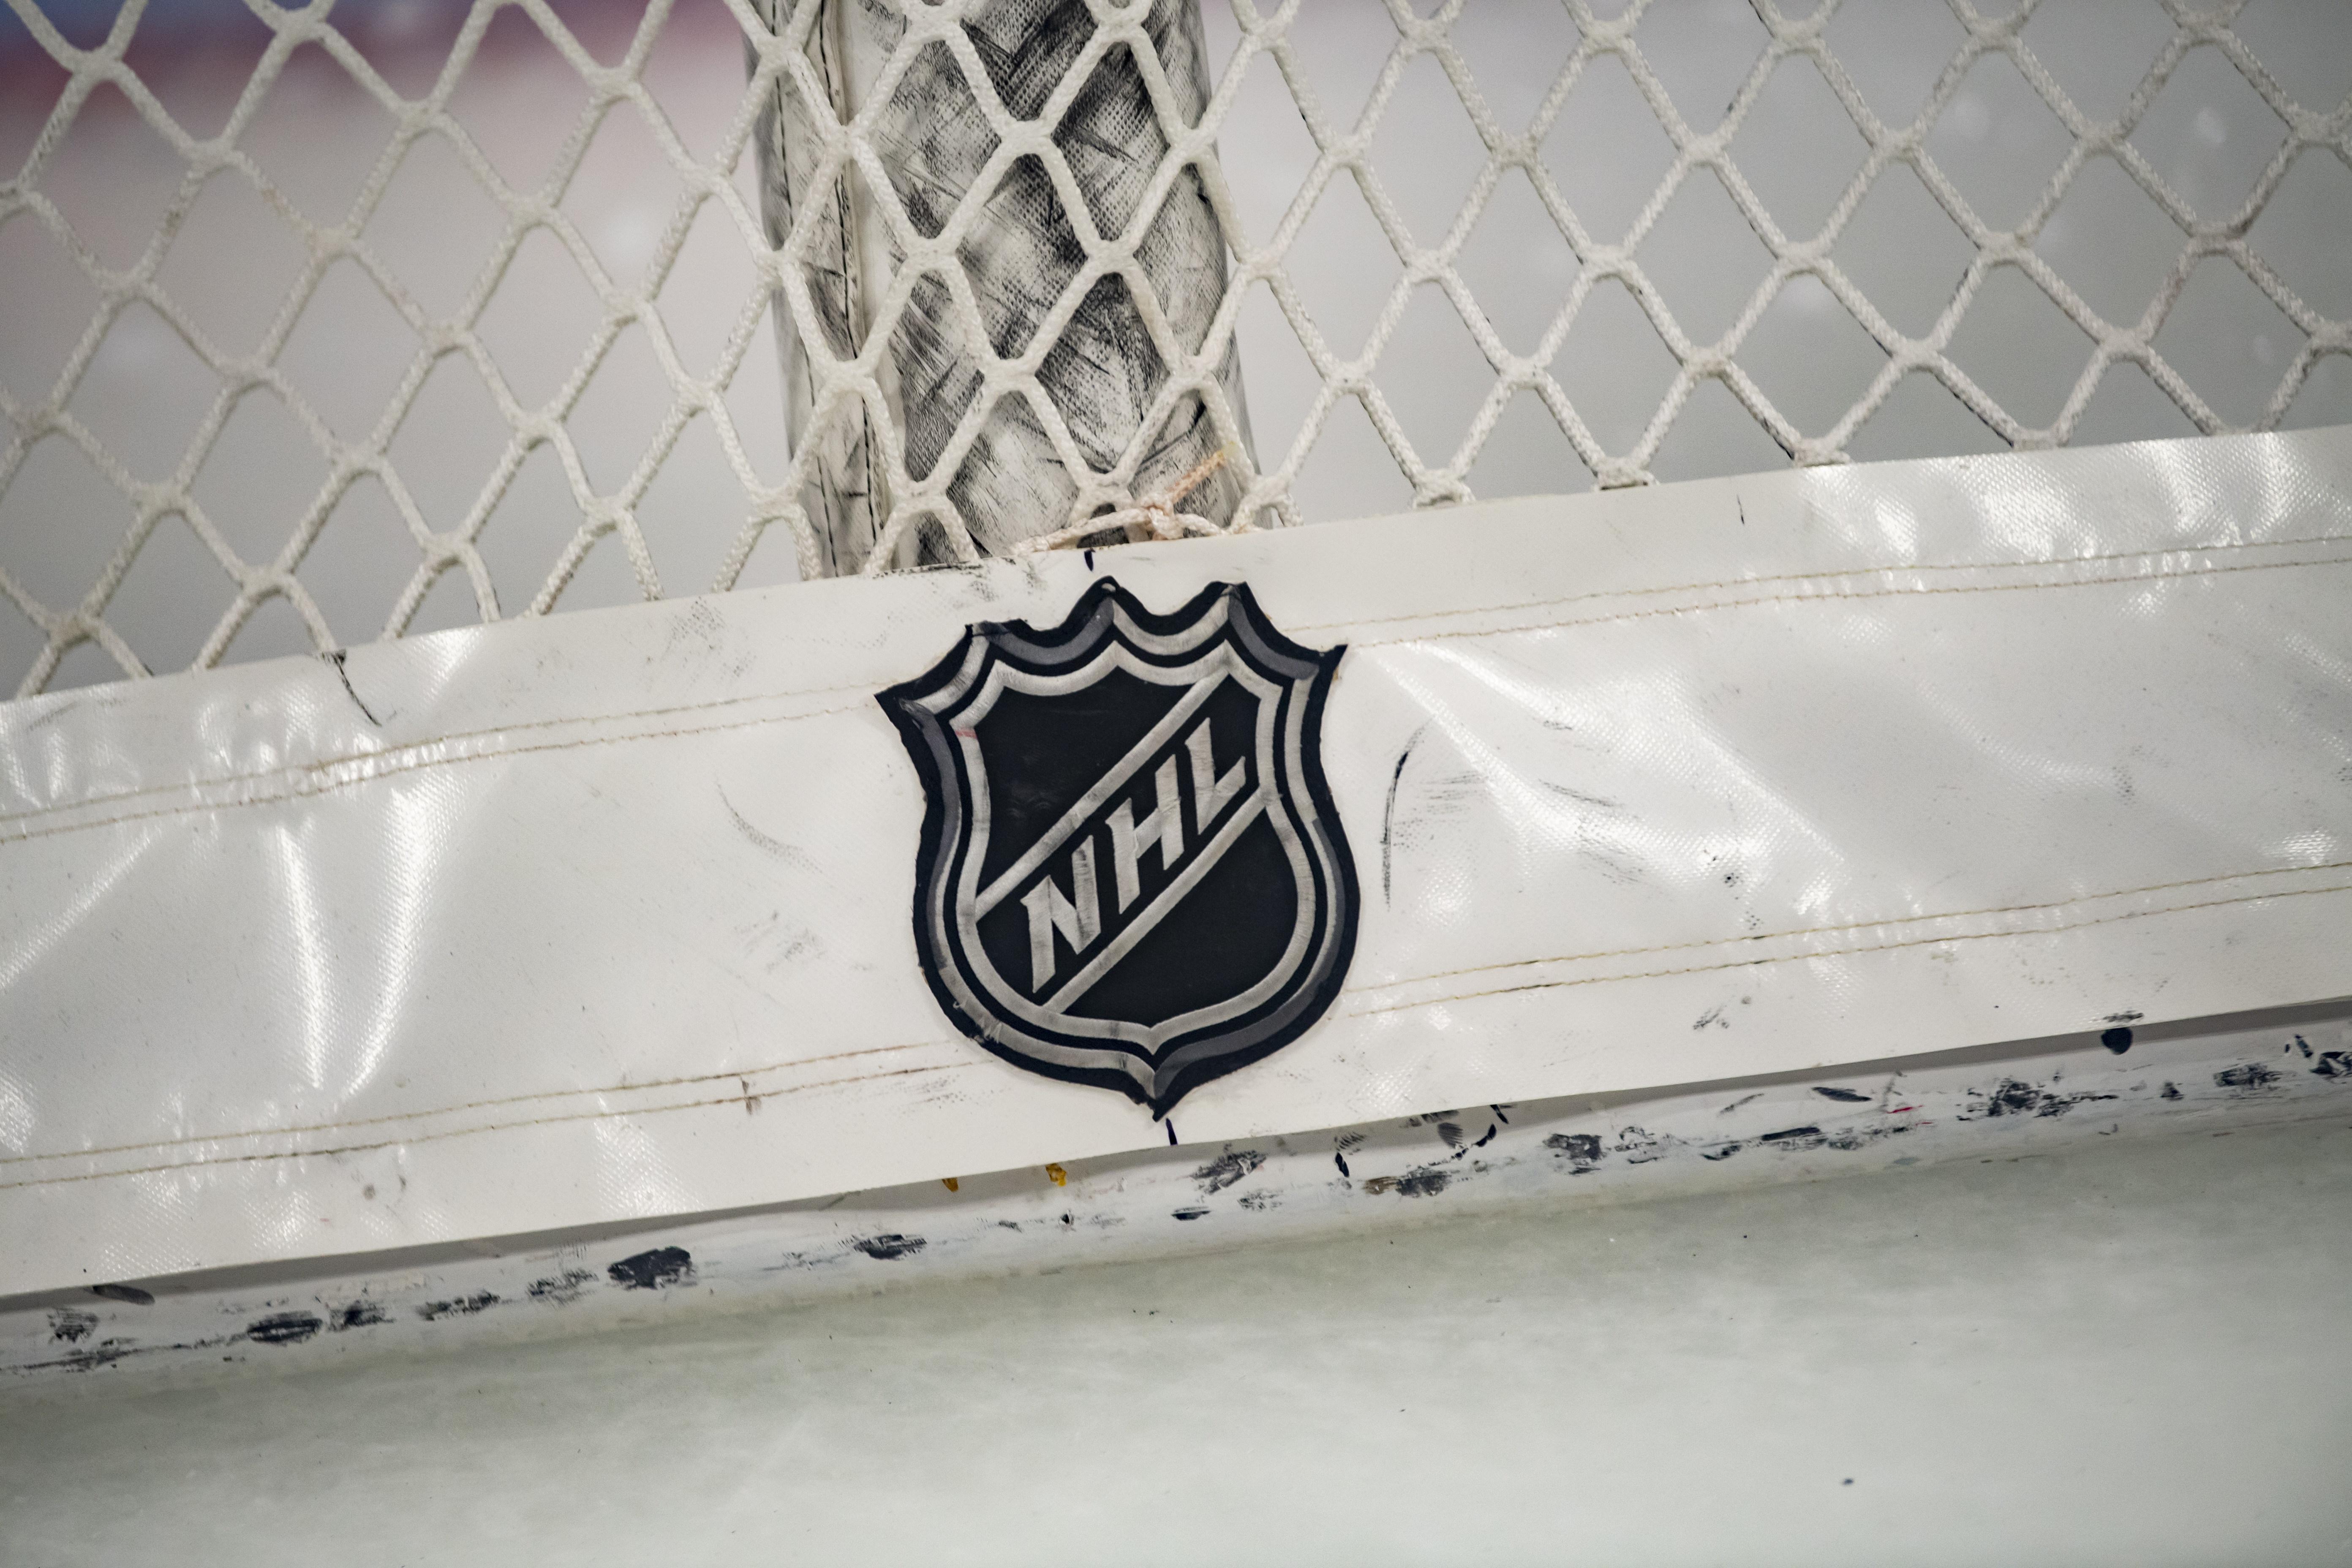 NHL: JAN 09 Predators at Blackhawks